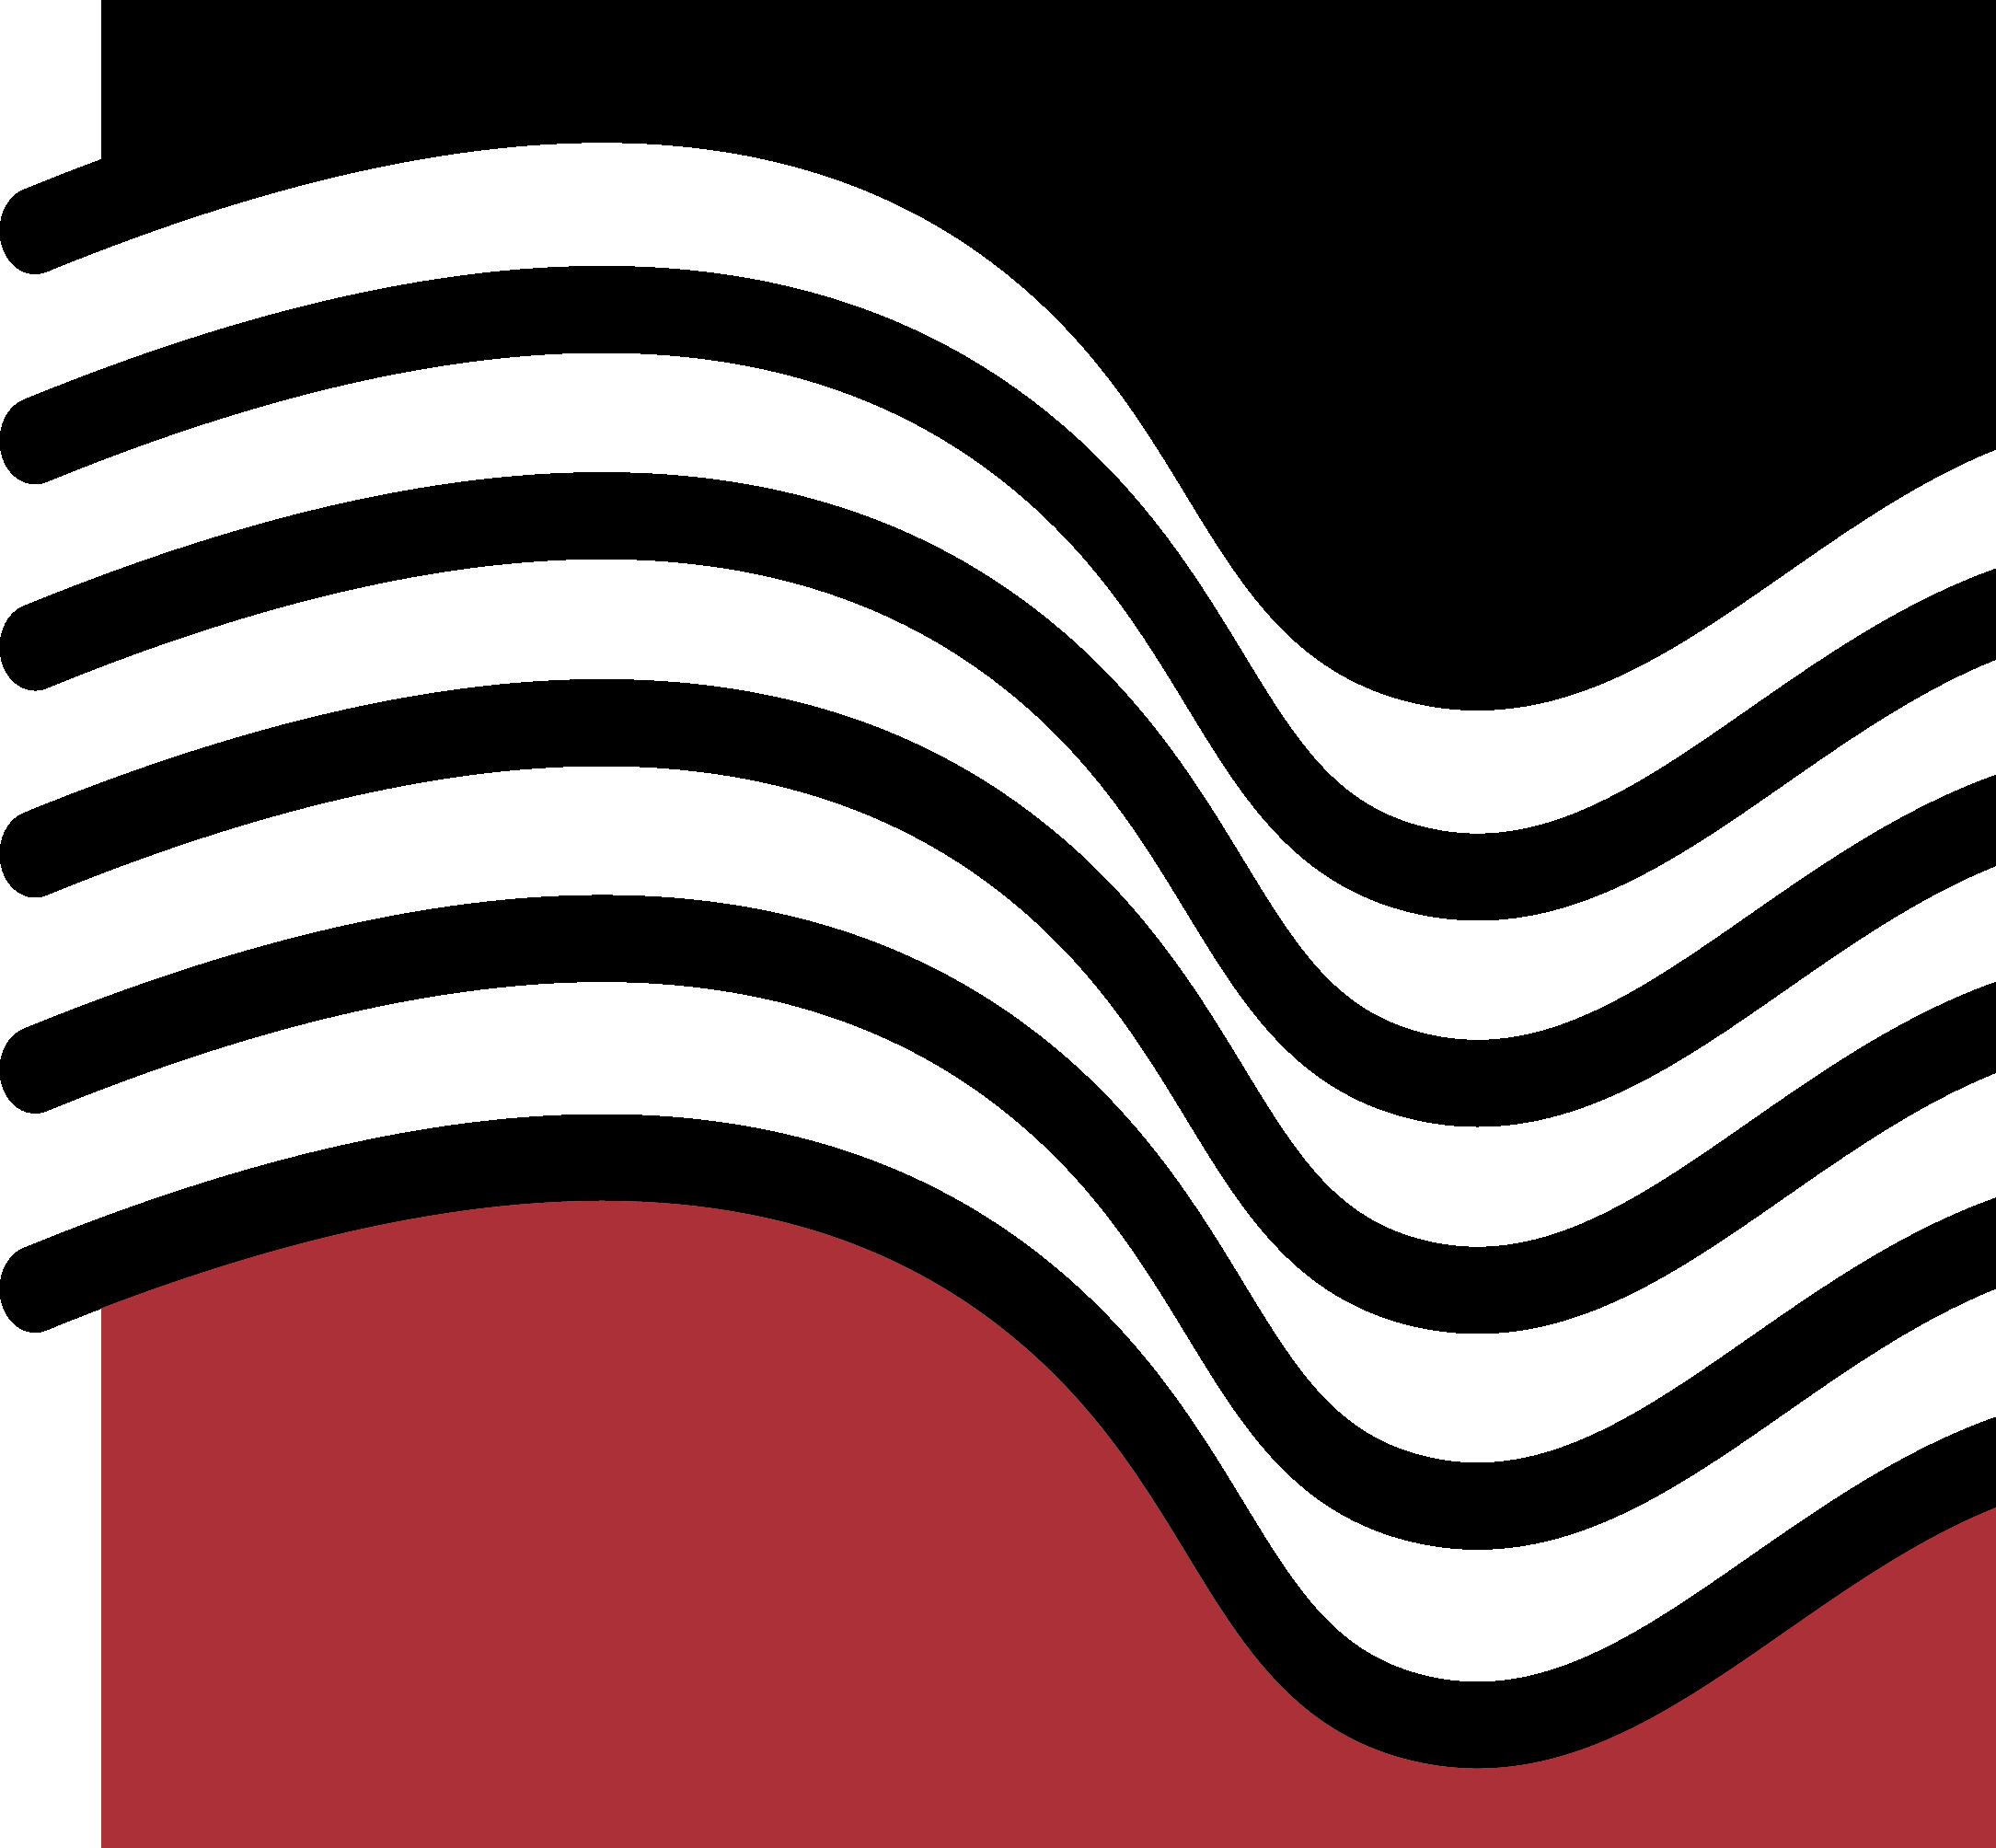 Bridge_logo color.png